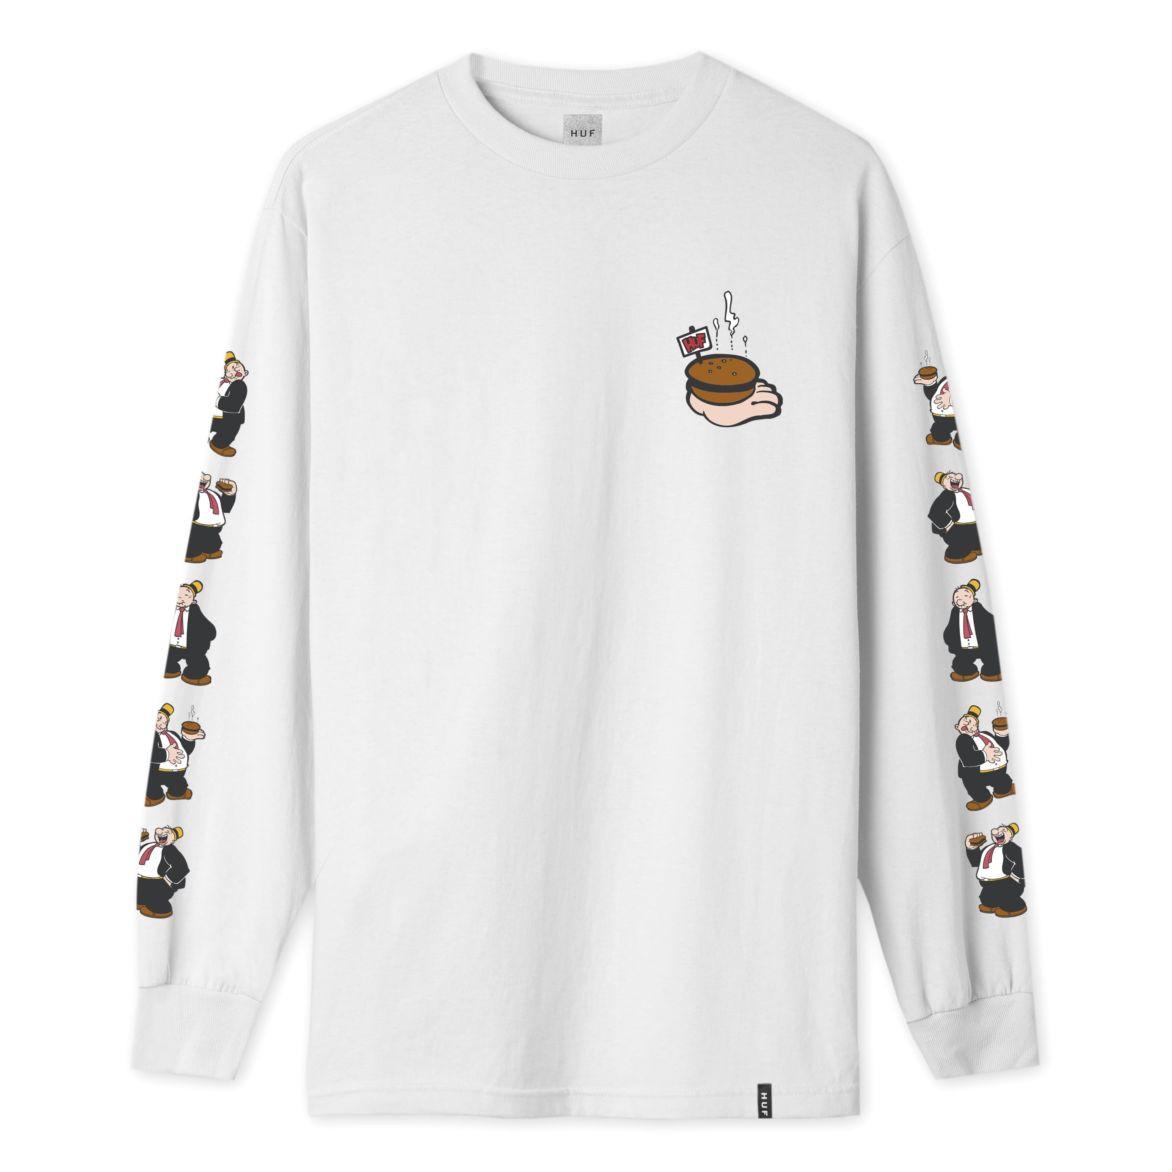 3dbf803473f48 HUF X Popeye Wimpy Long Sleeve Tee - White